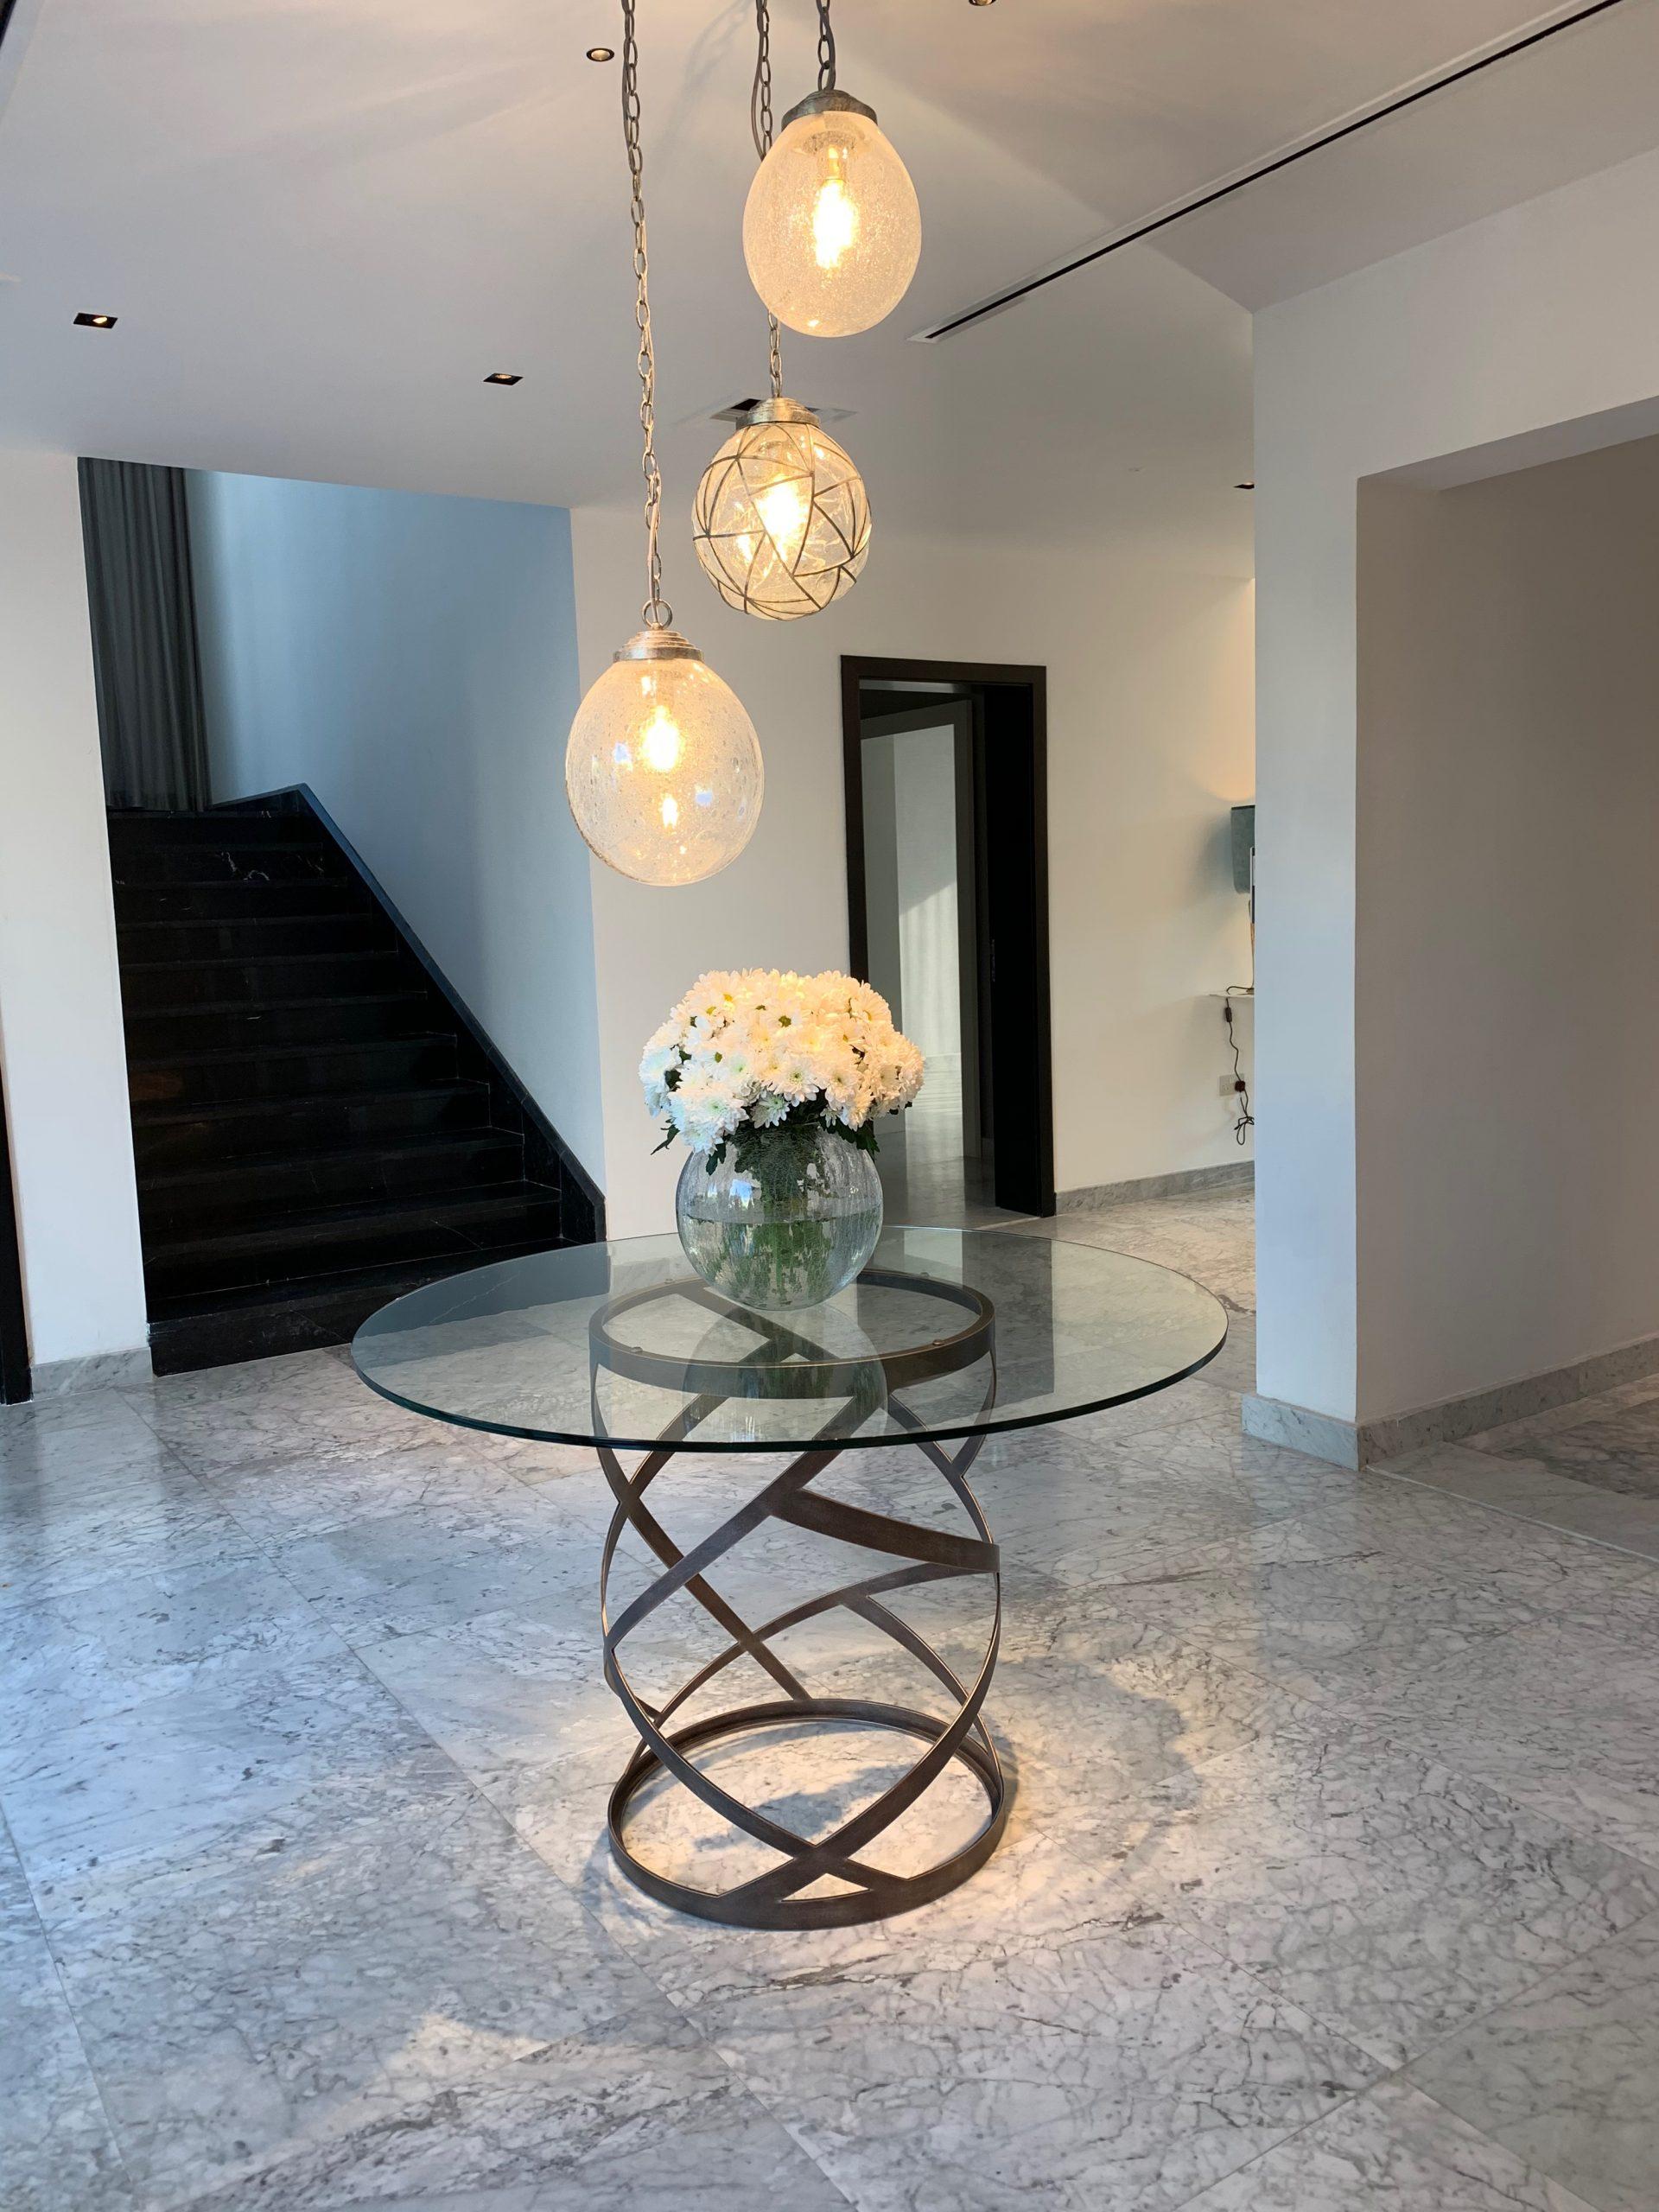 Tom Faulkner furniture in Dubai featured in the John Cullen Dubai showroom